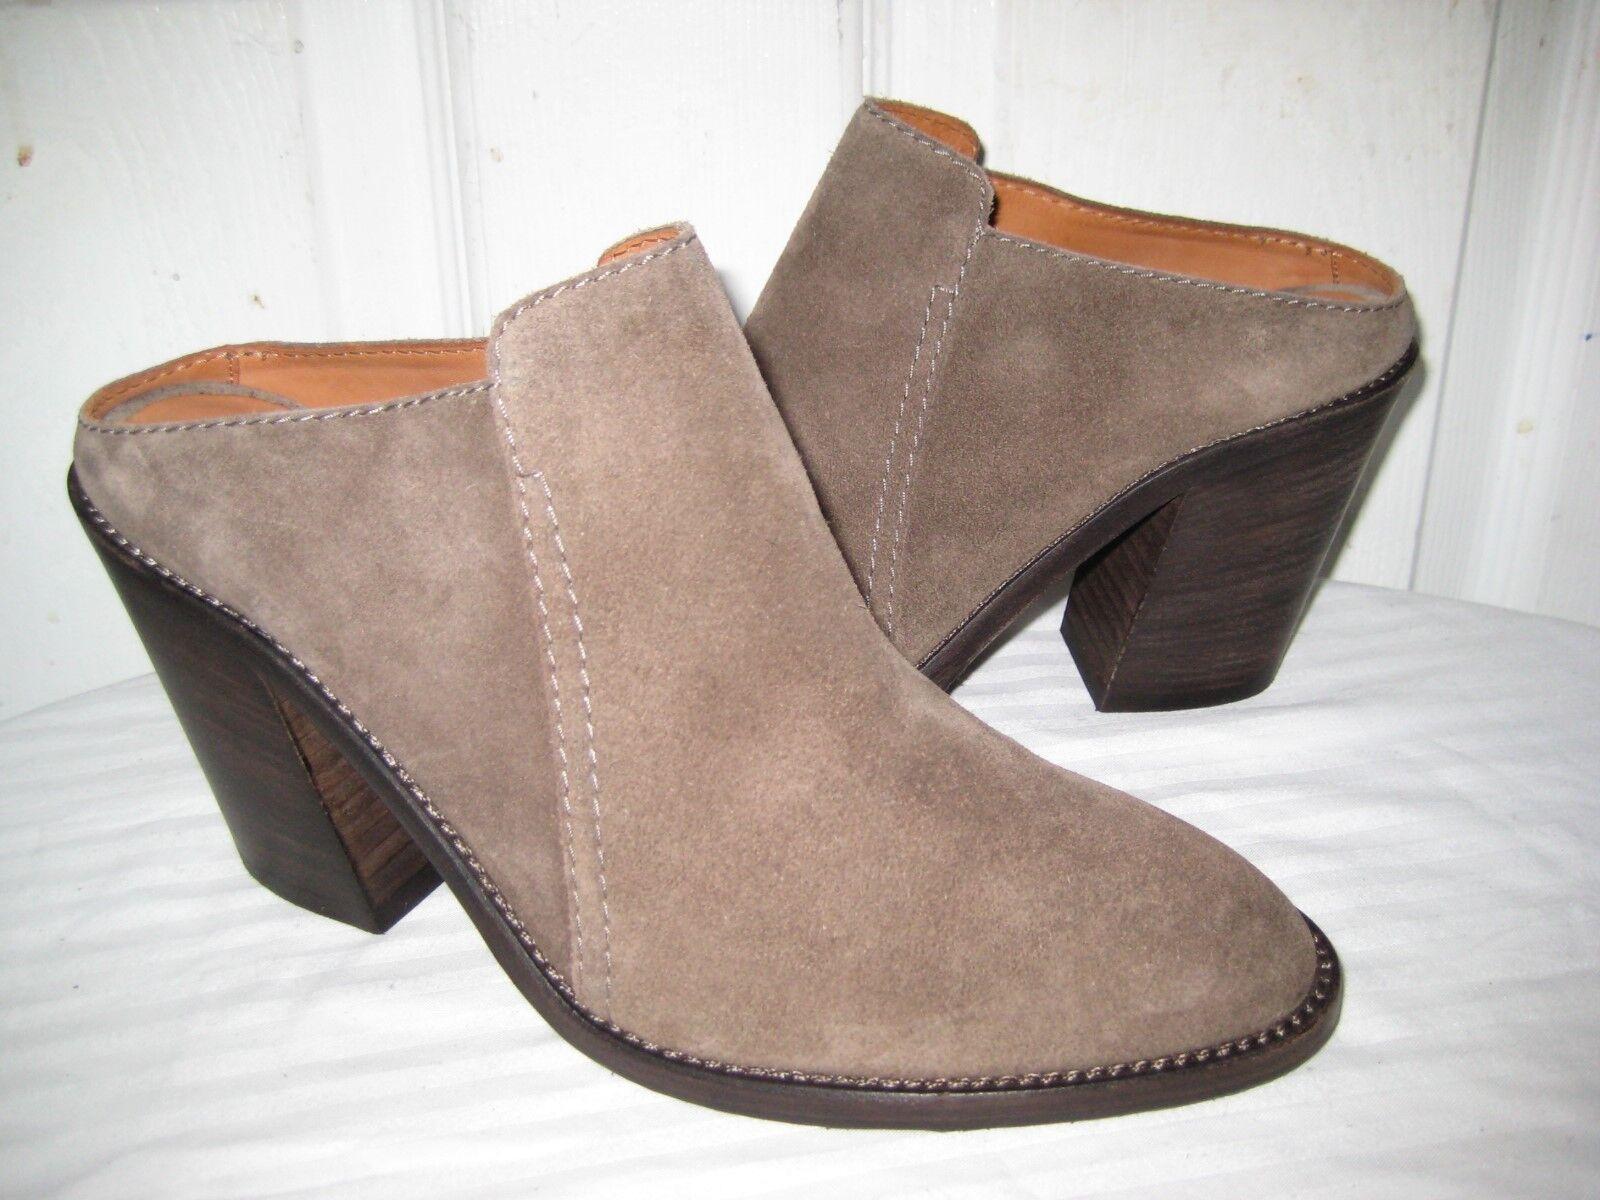 Aquatalia Aquatalia Aquatalia  Libby Brush Oil Suede Leather Mule shoes Womens Size 9 c15bdd